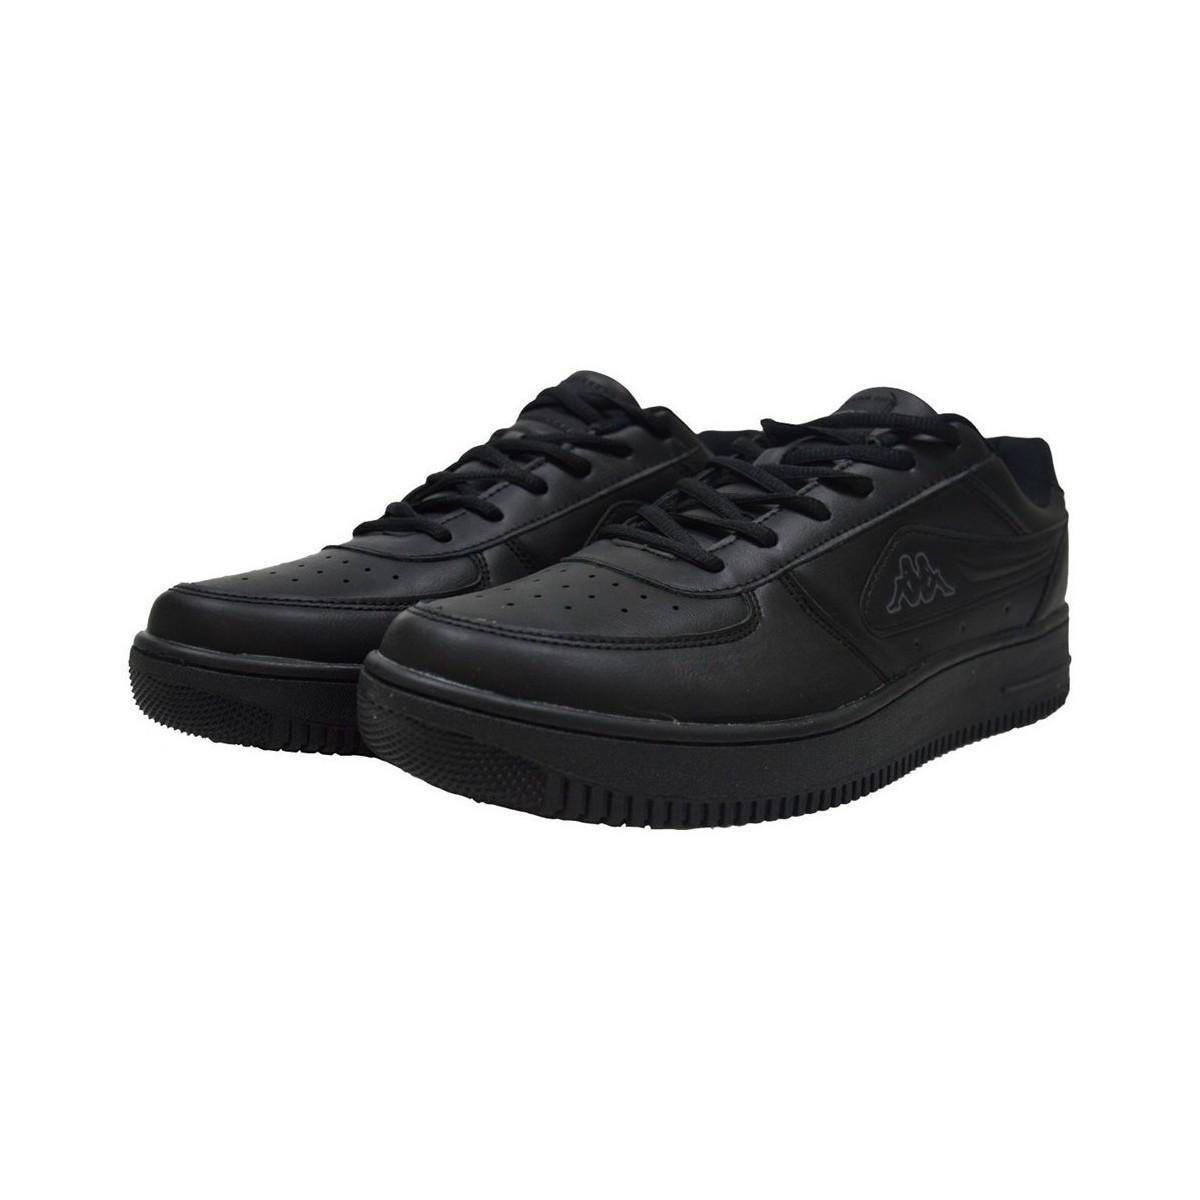 wylot online za pół ponadczasowy design Kappa Bash Men's Shoes (trainers) In Black for men